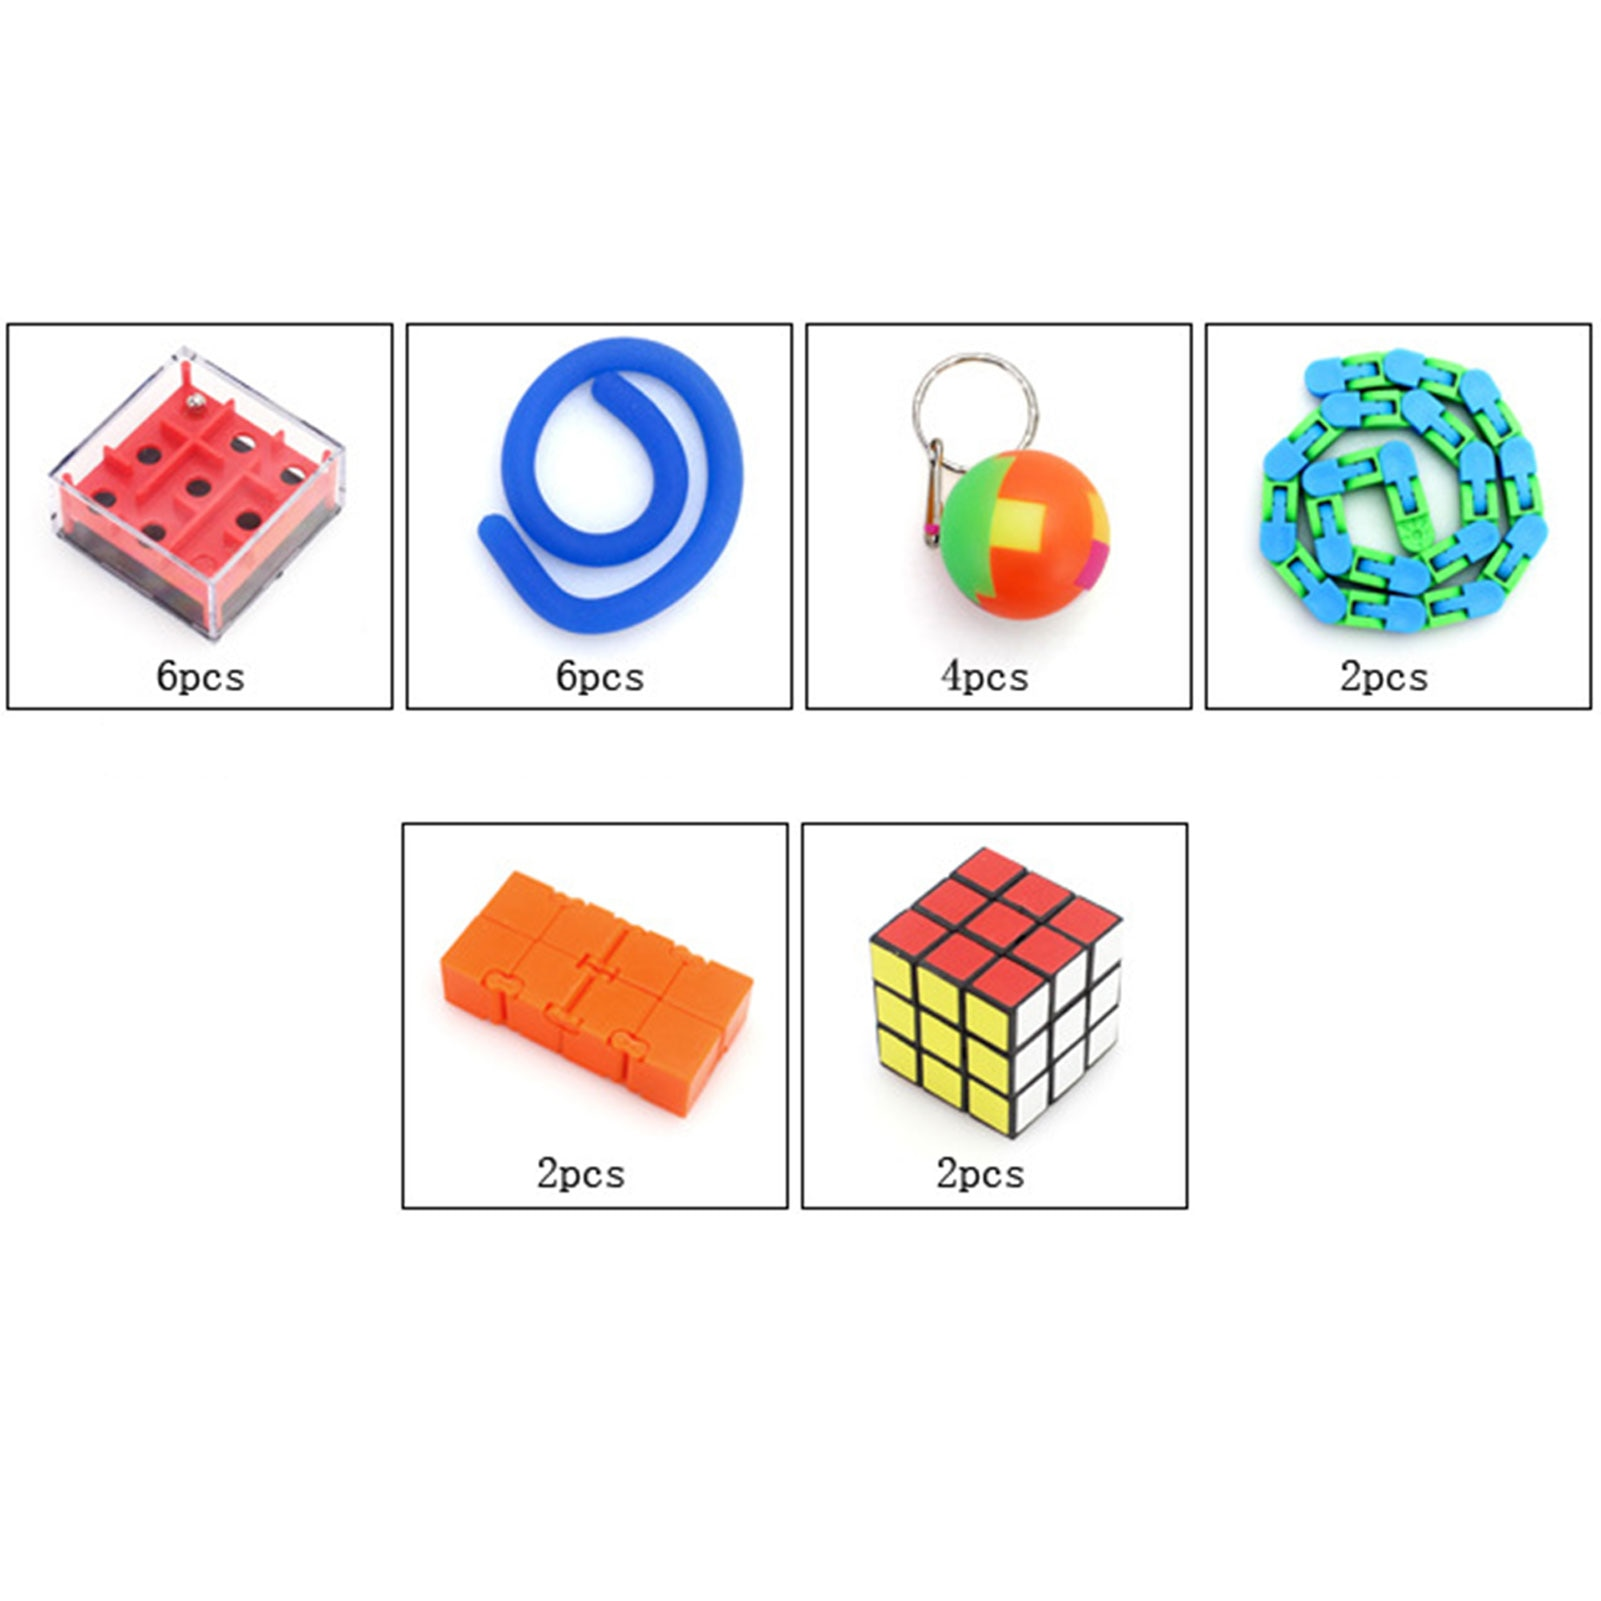 24 IN 1 Fidget Sensory Toys Set Party Favors Fidget Hand Toys For Kids Adults Simple Dimple Fidget Toy enlarge